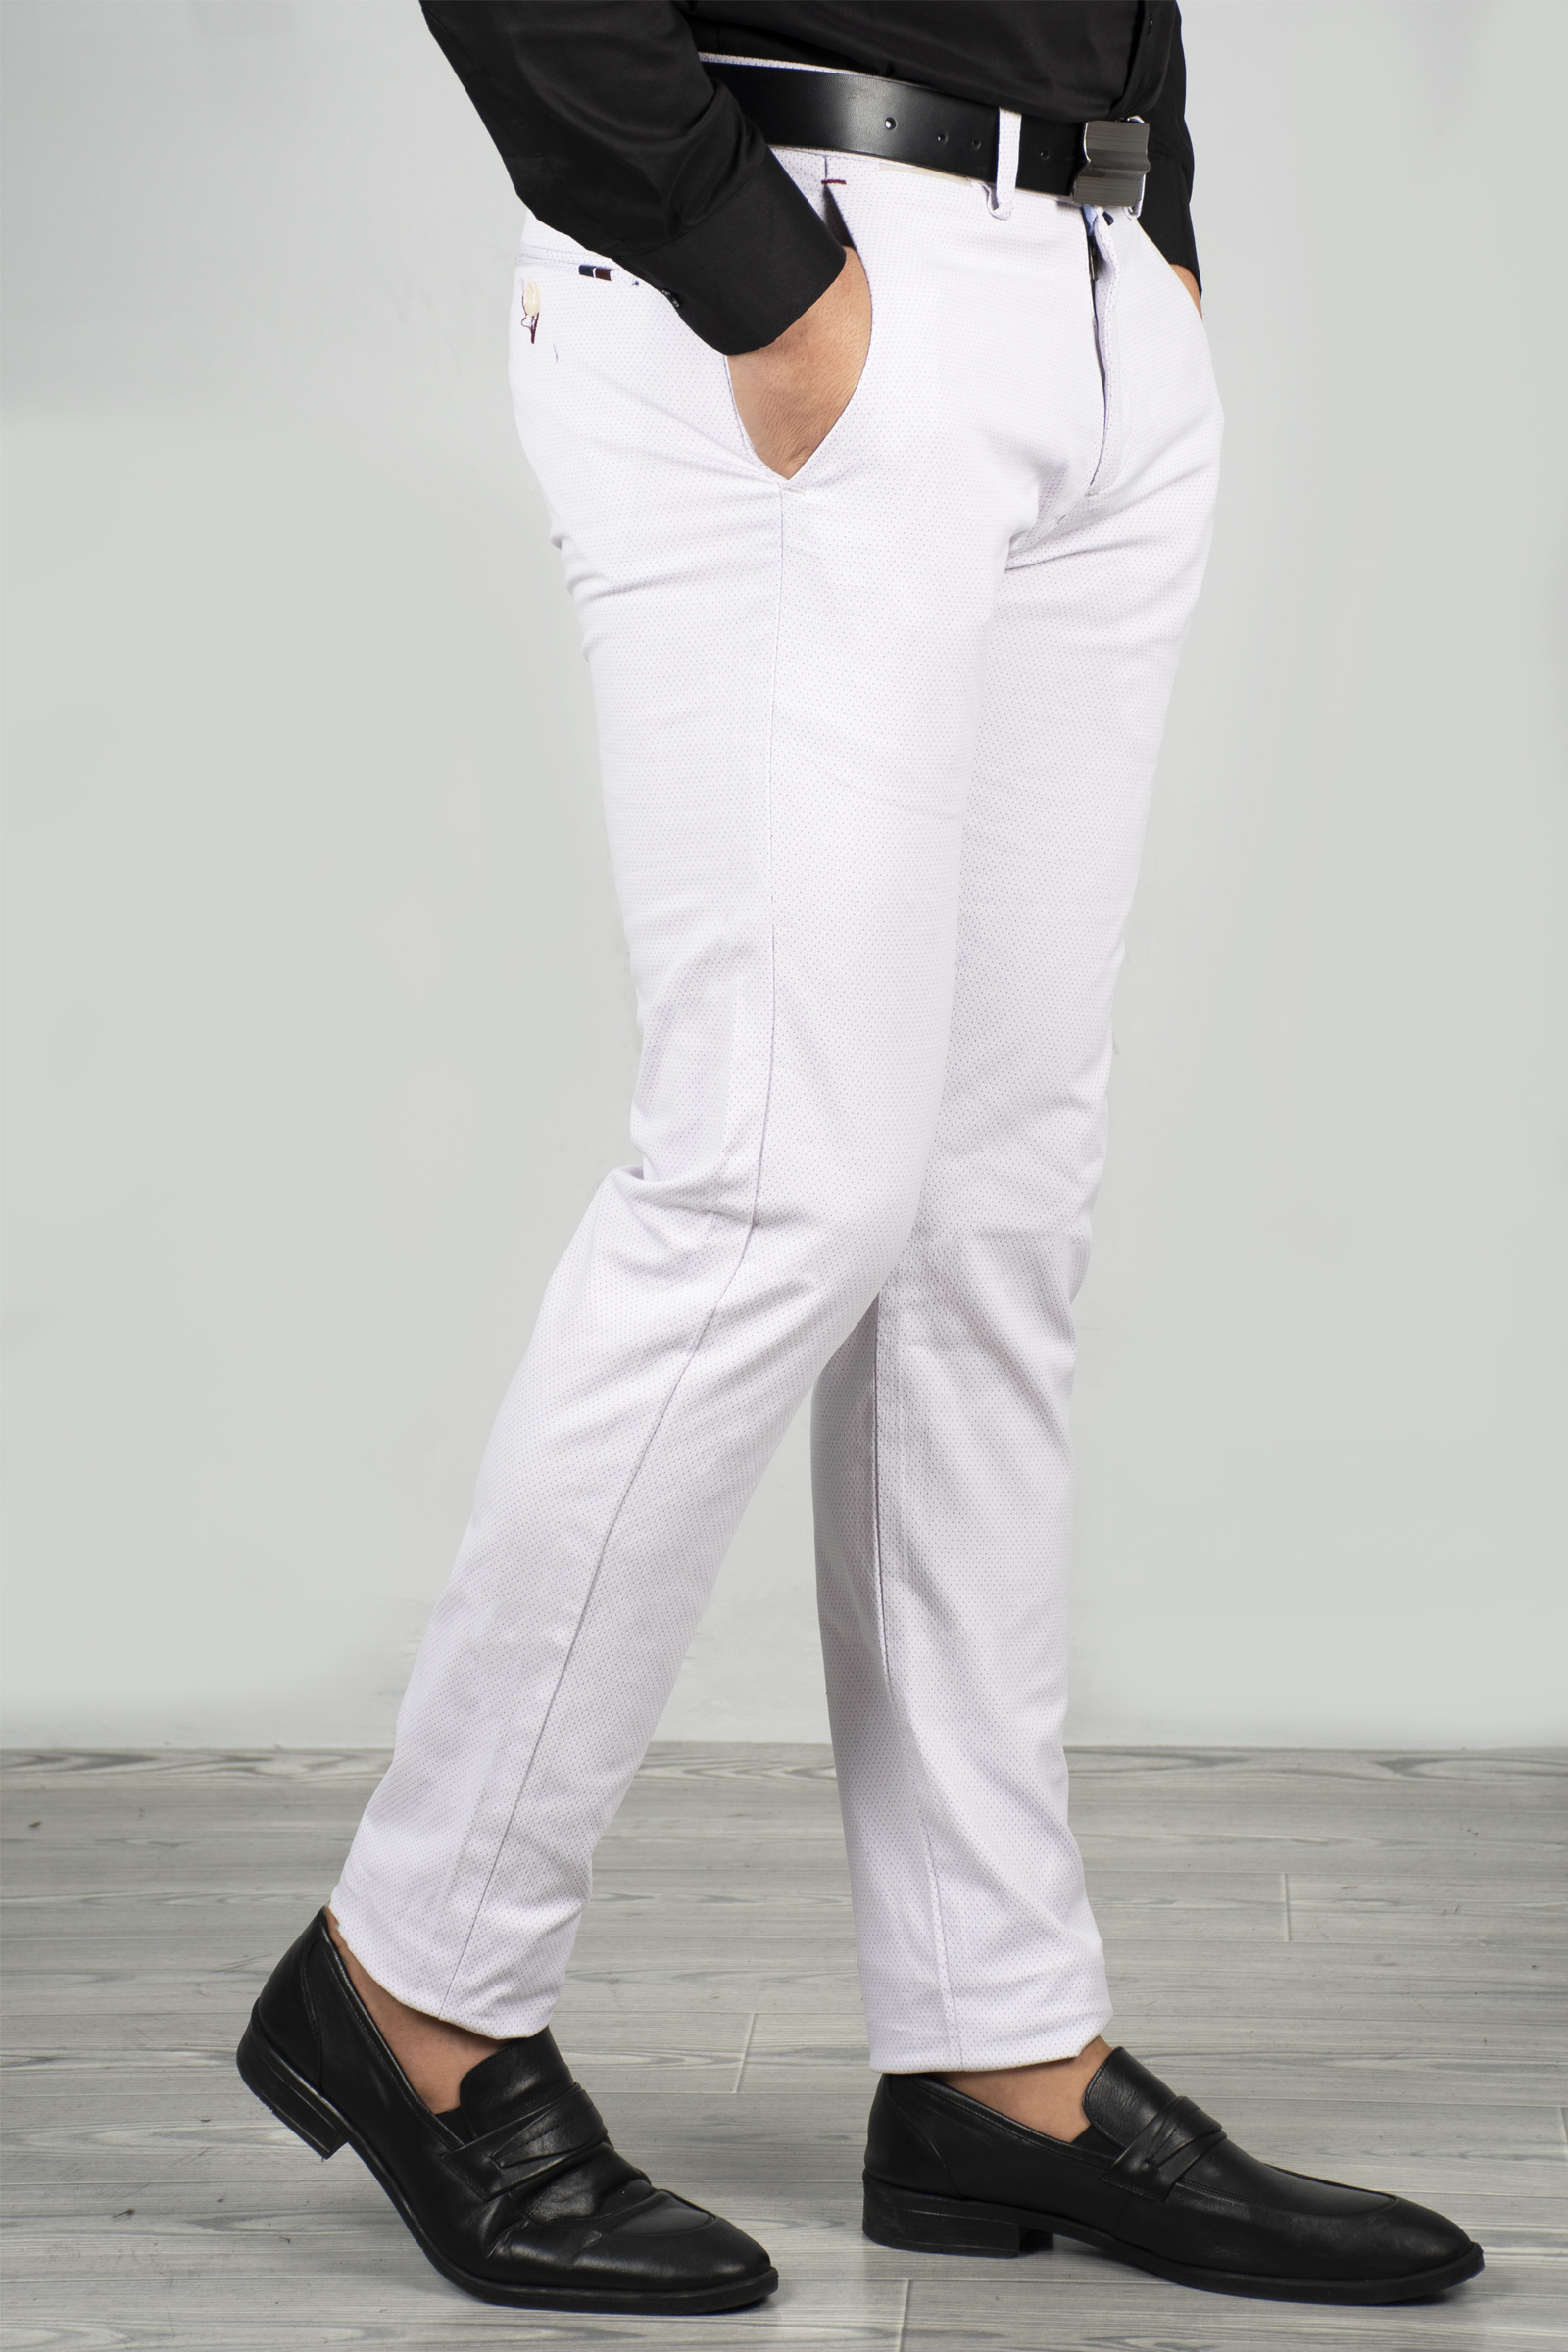 DeepSEA Men Ecru Suit Dress Pants Fabric Slim Fit Cotton Lycra Classic Italian Groom Wedding Business Formal Four Seasons 1805007